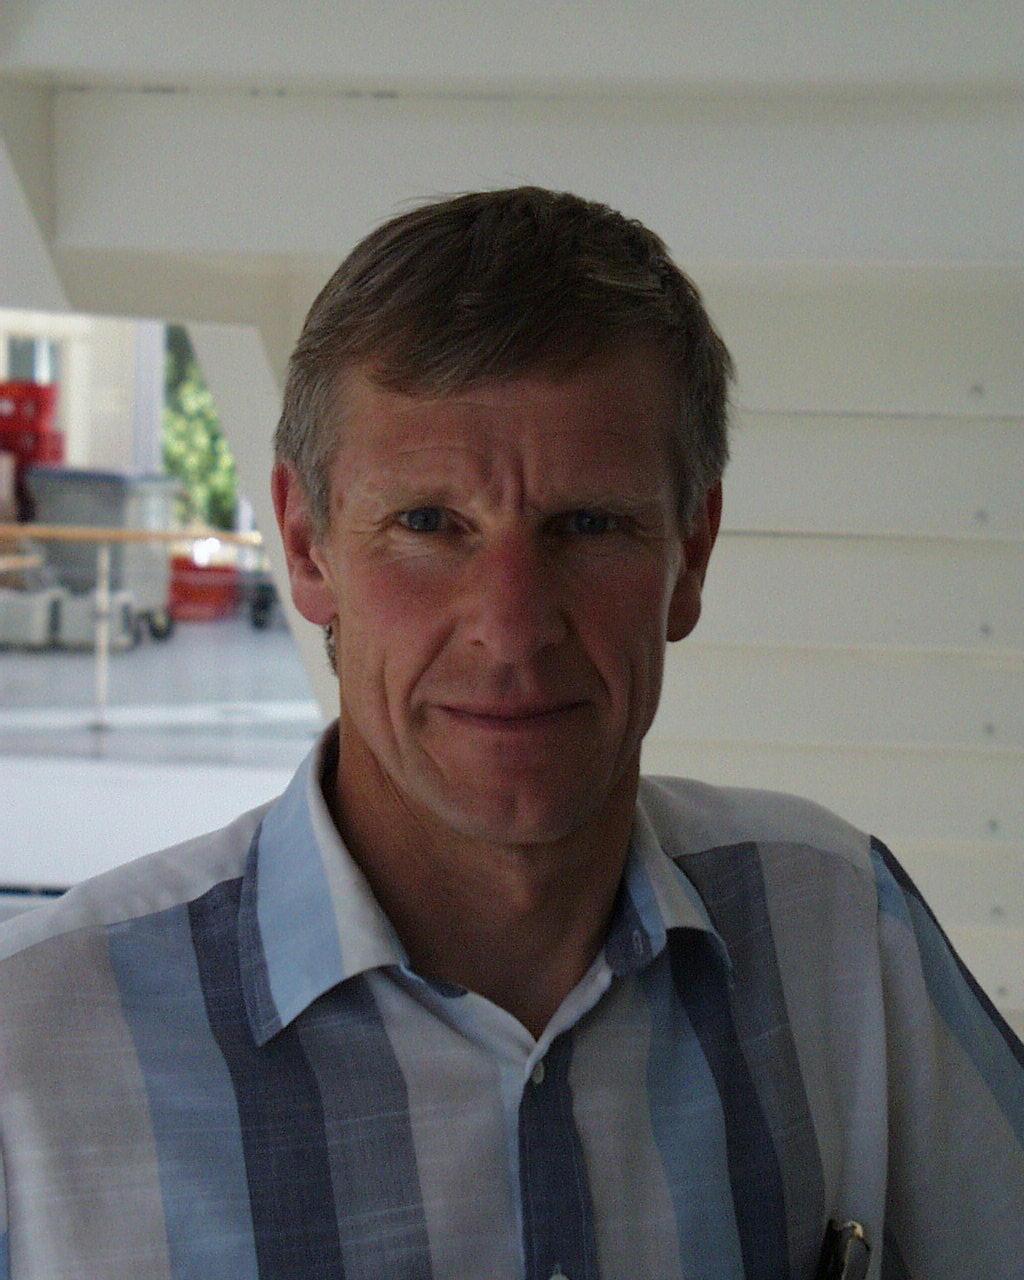 Arild Jansen, portrett. Foto: UiO